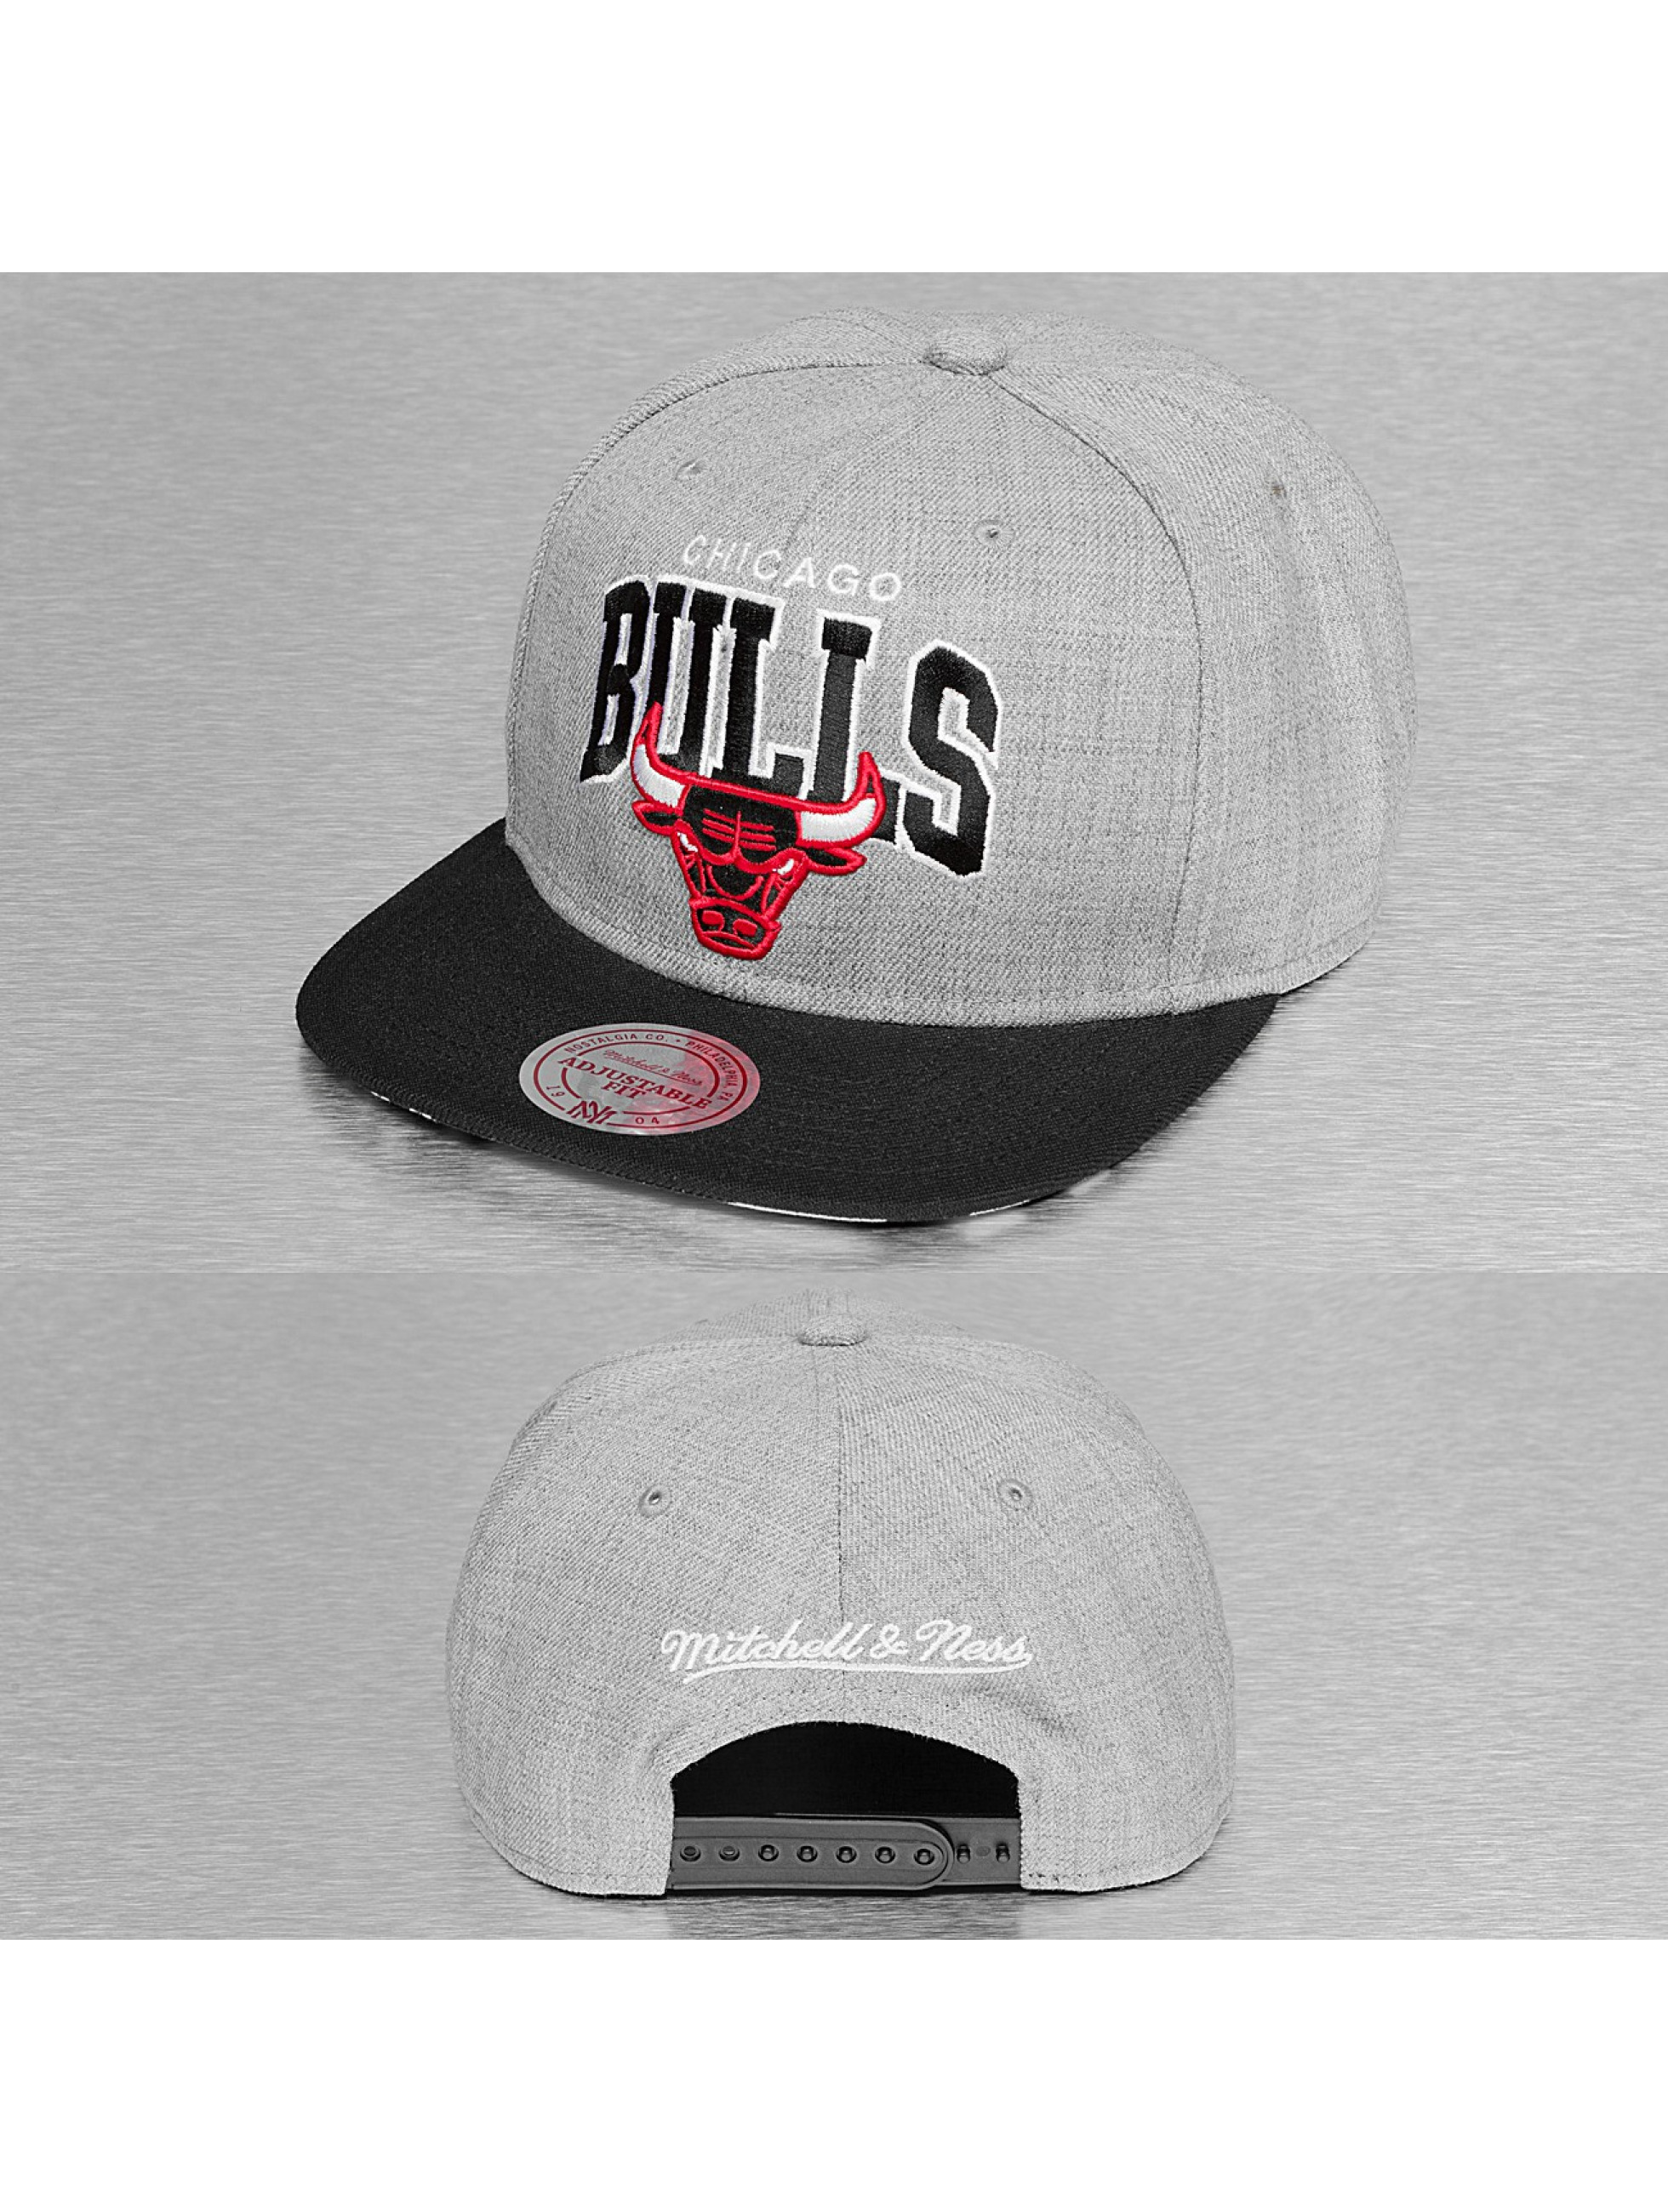 Mitchell & Ness Casquette Snapback & Strapback Black USA Chicago Bulls gris